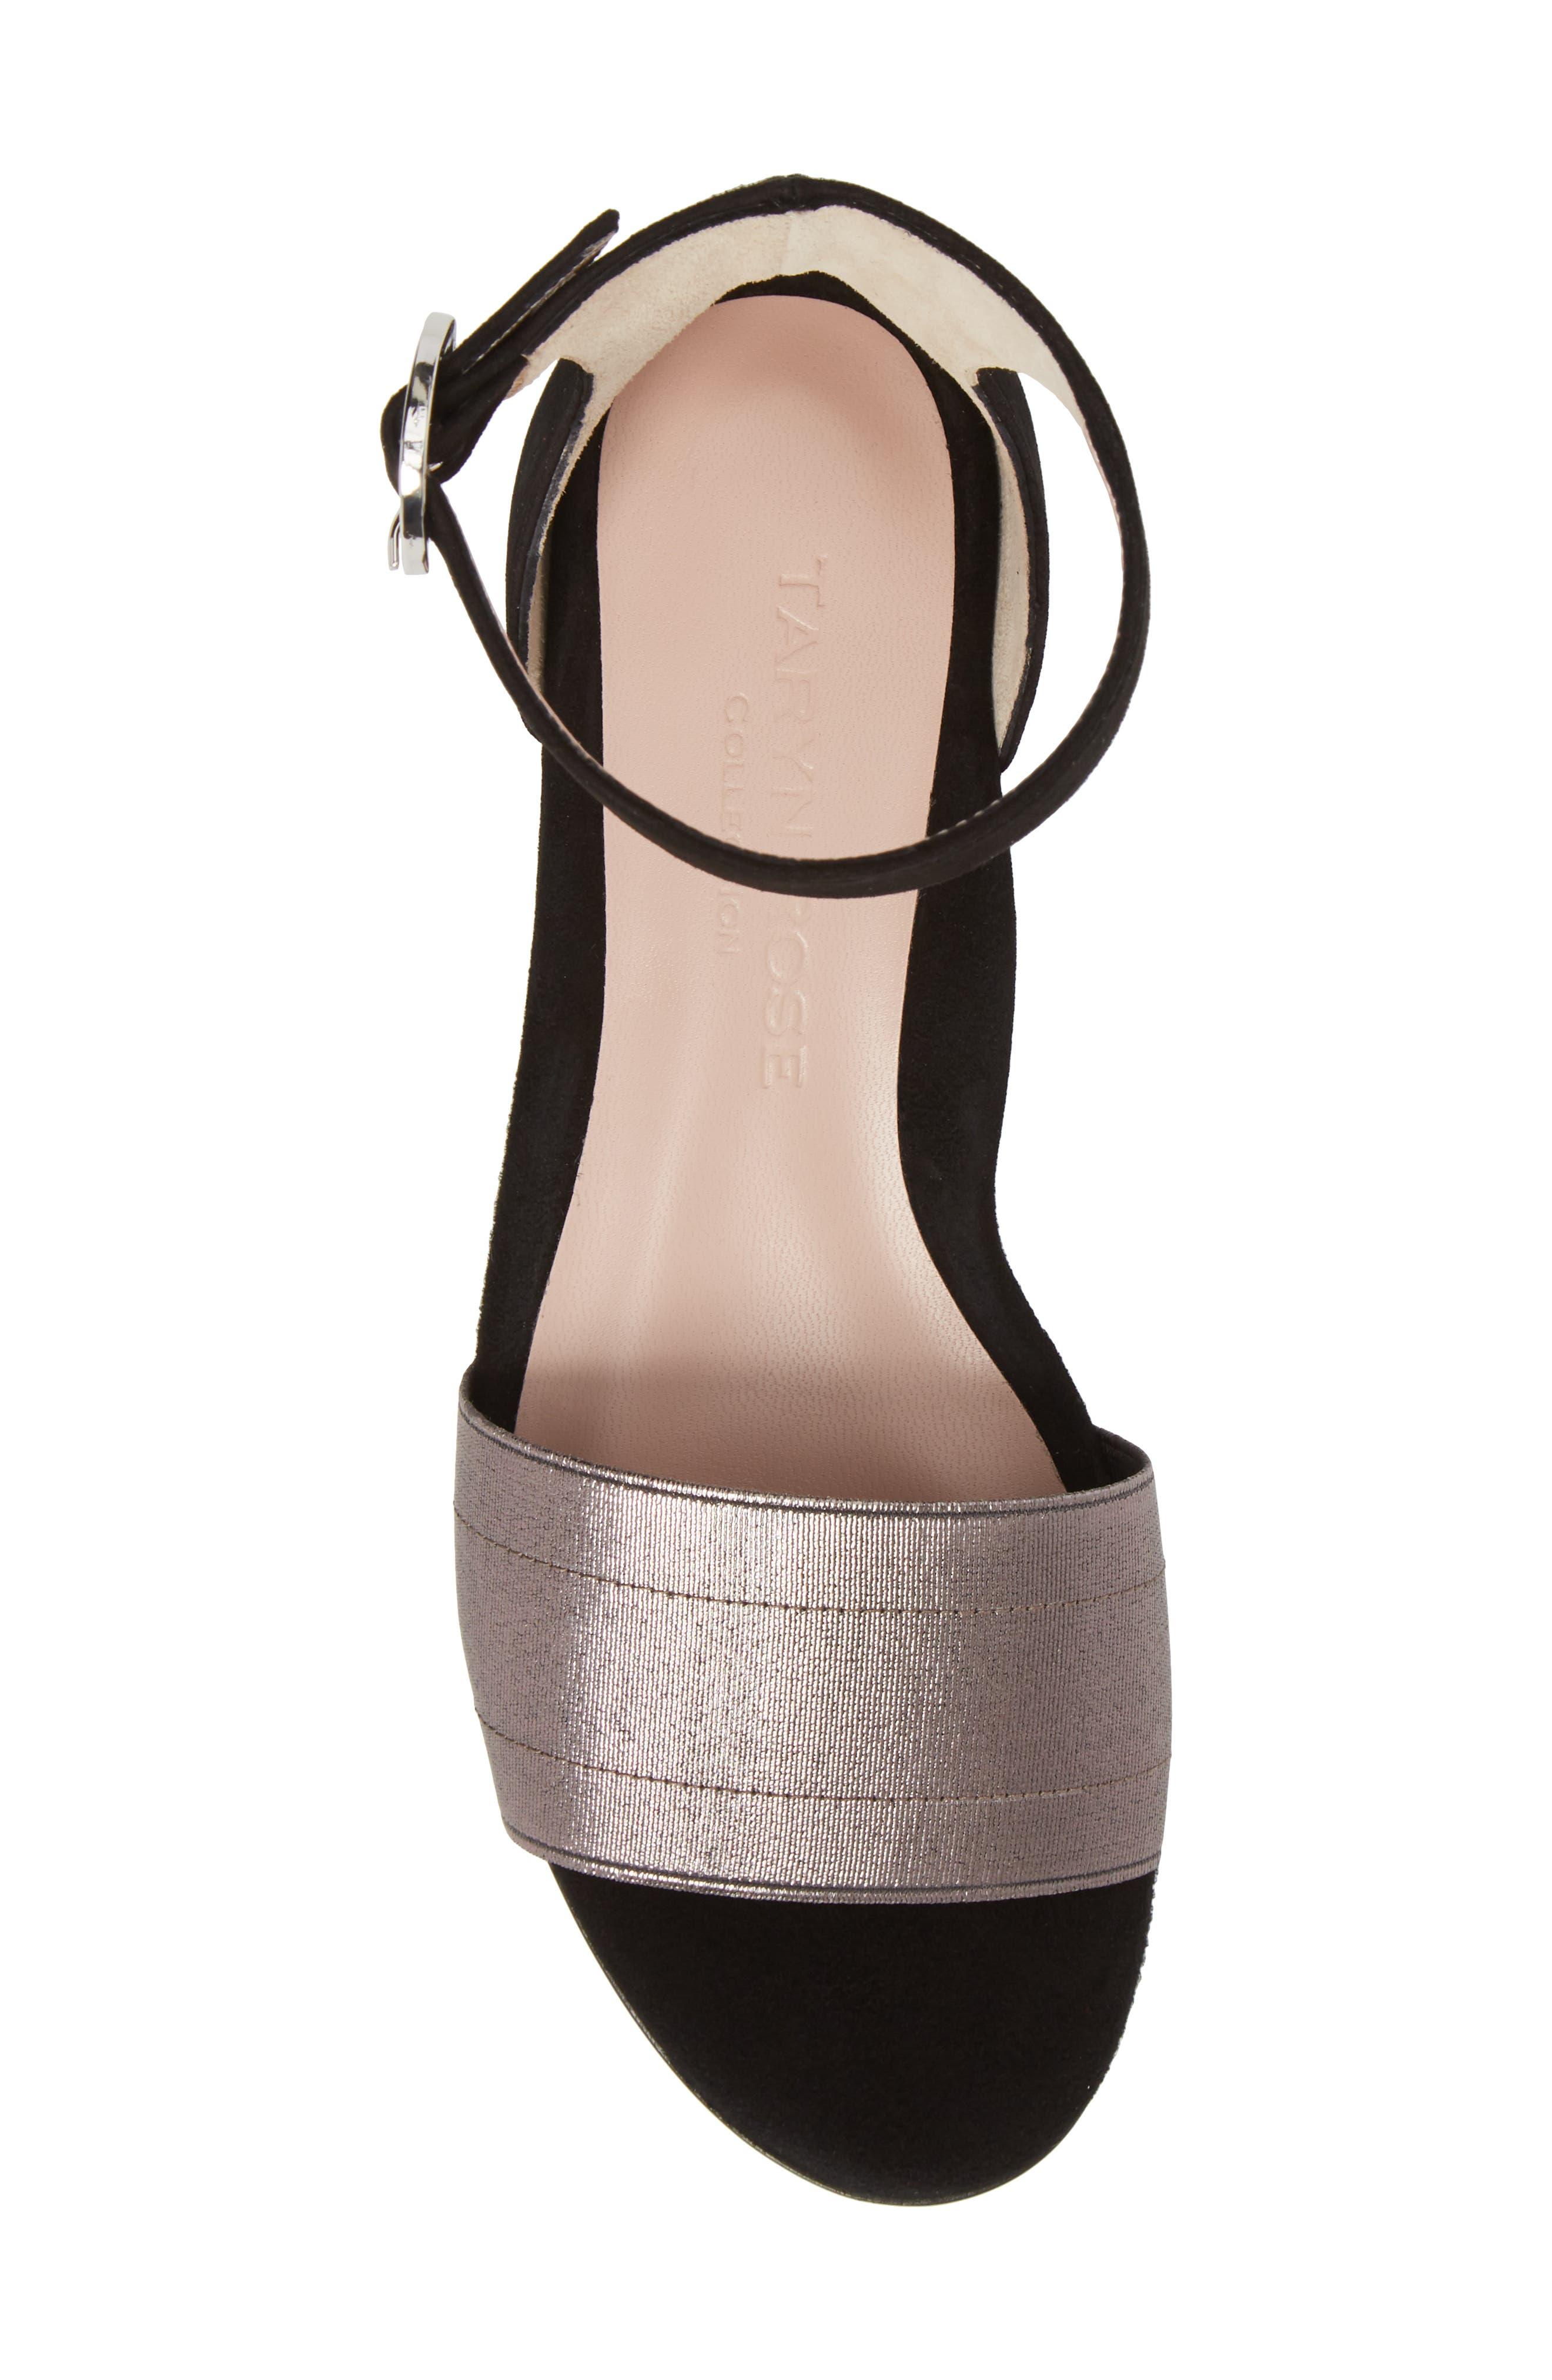 Donati Ankle Strap Sandal,                             Alternate thumbnail 5, color,                             Black/ Gunmetal Suede